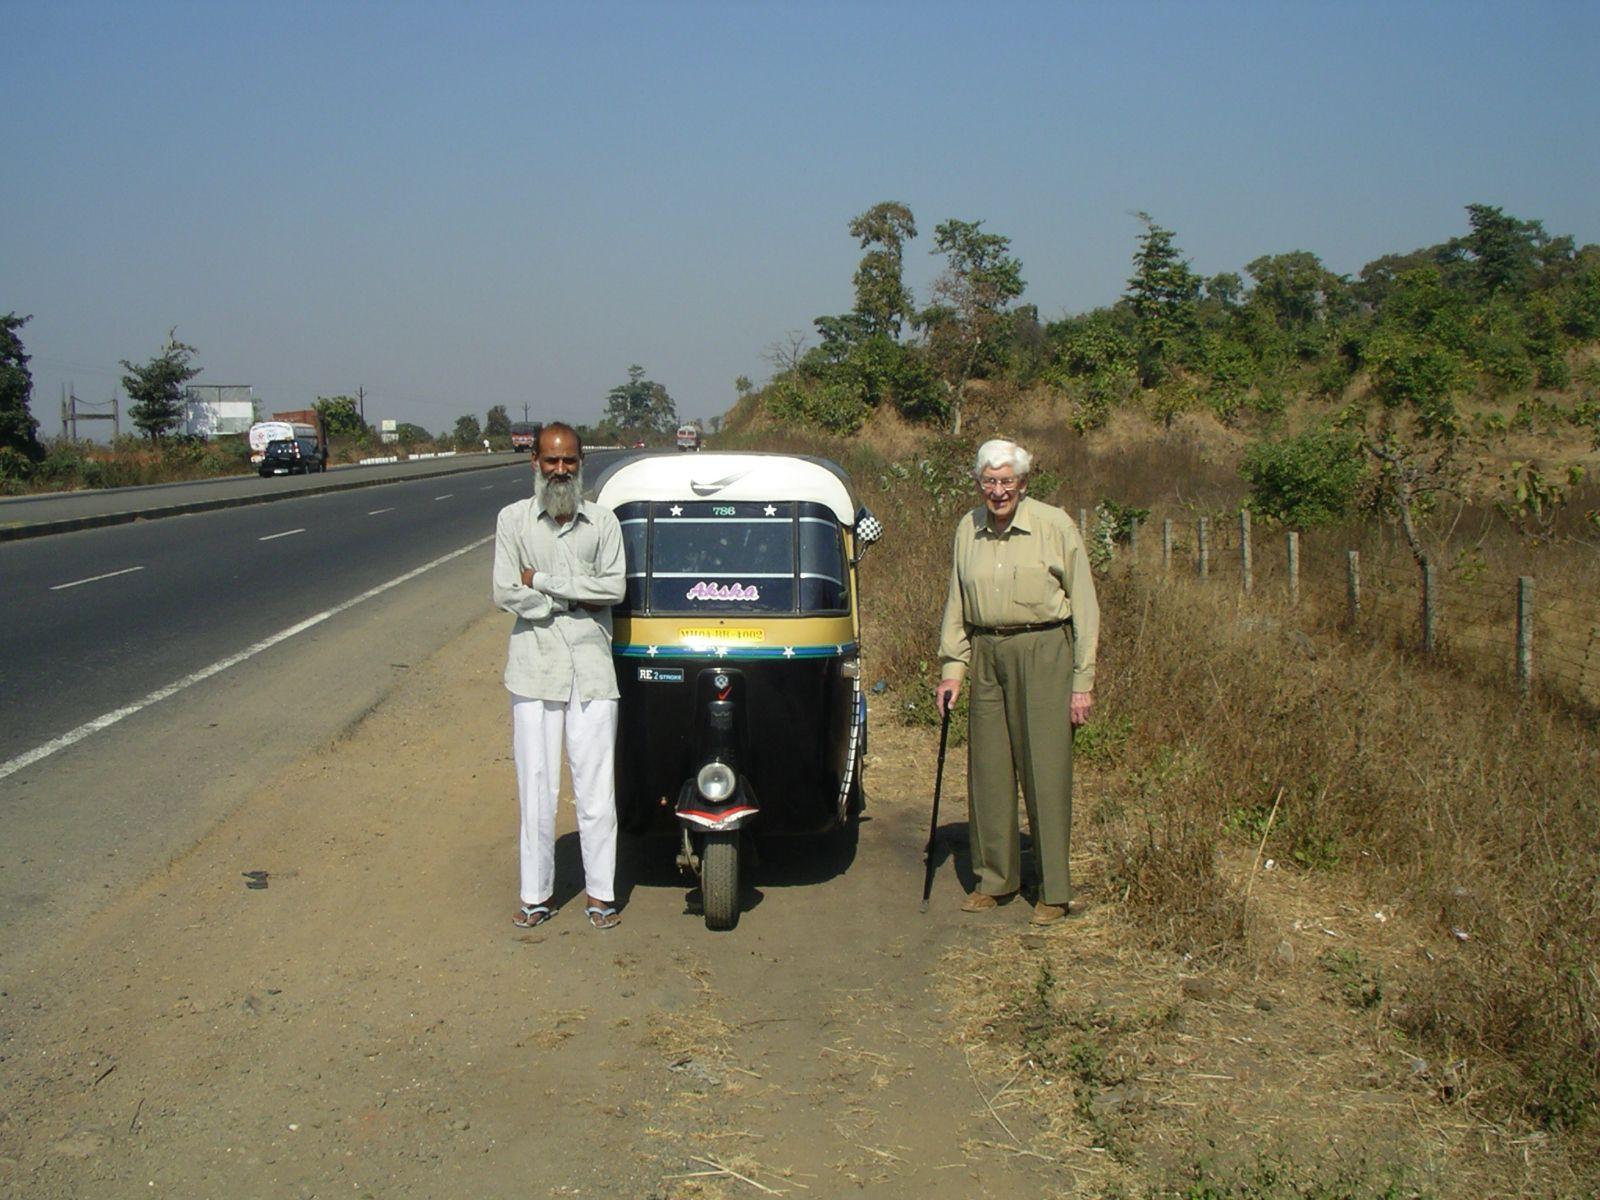 Felix Heidenstam - long-distance by auto-rickshaw!